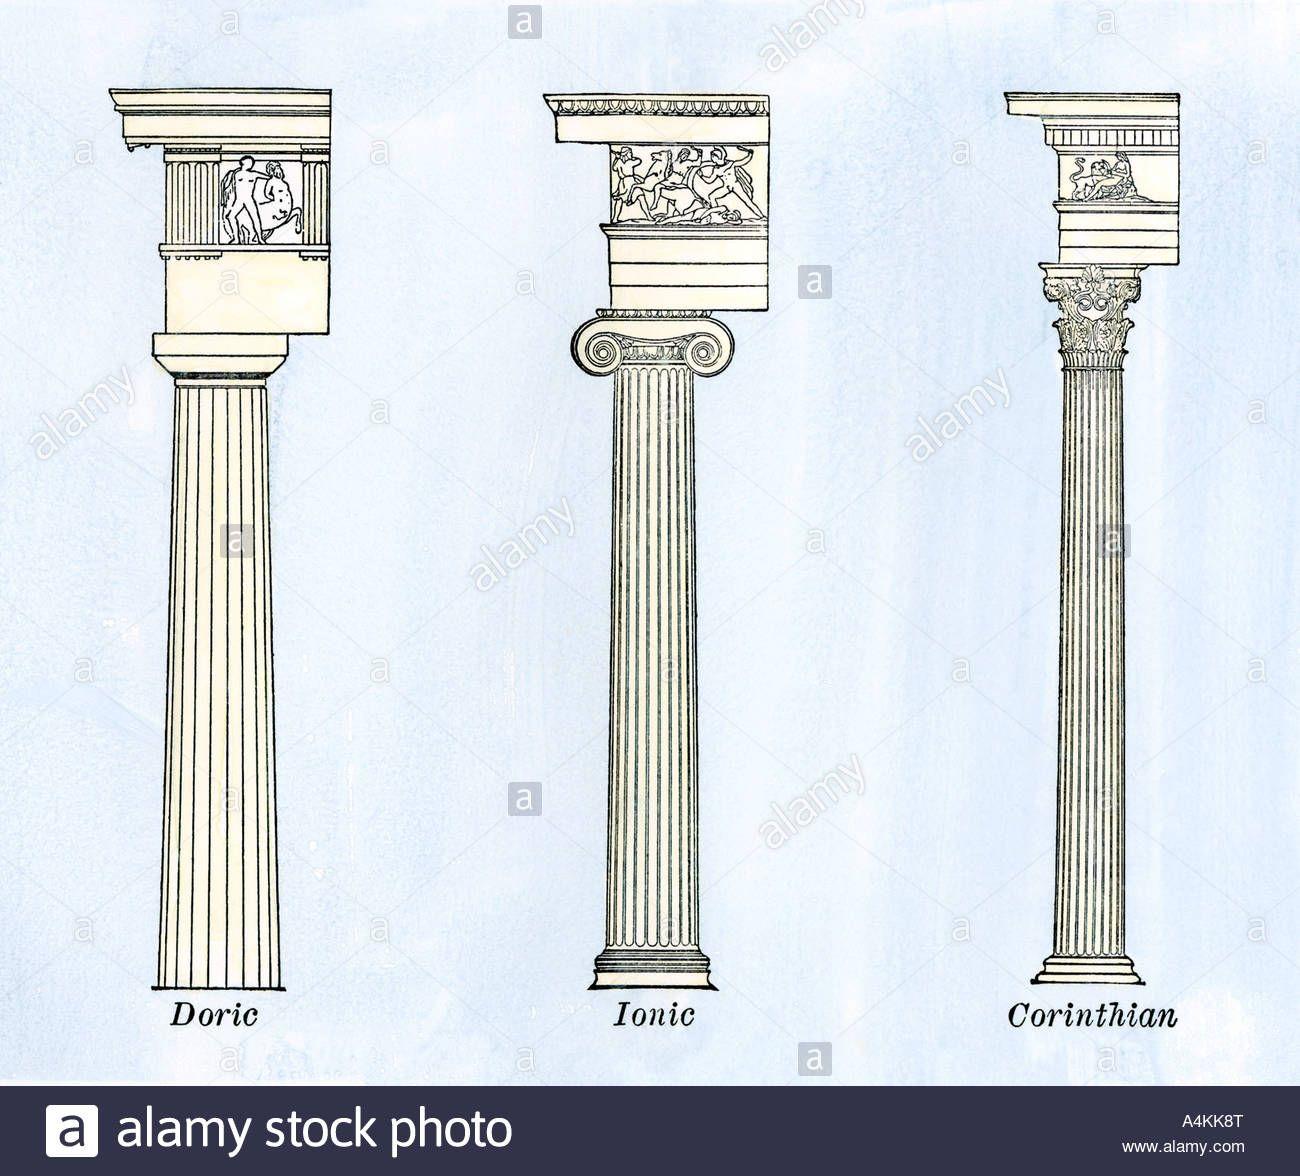 Doric Columns Vs Ionic Vs Corinthian